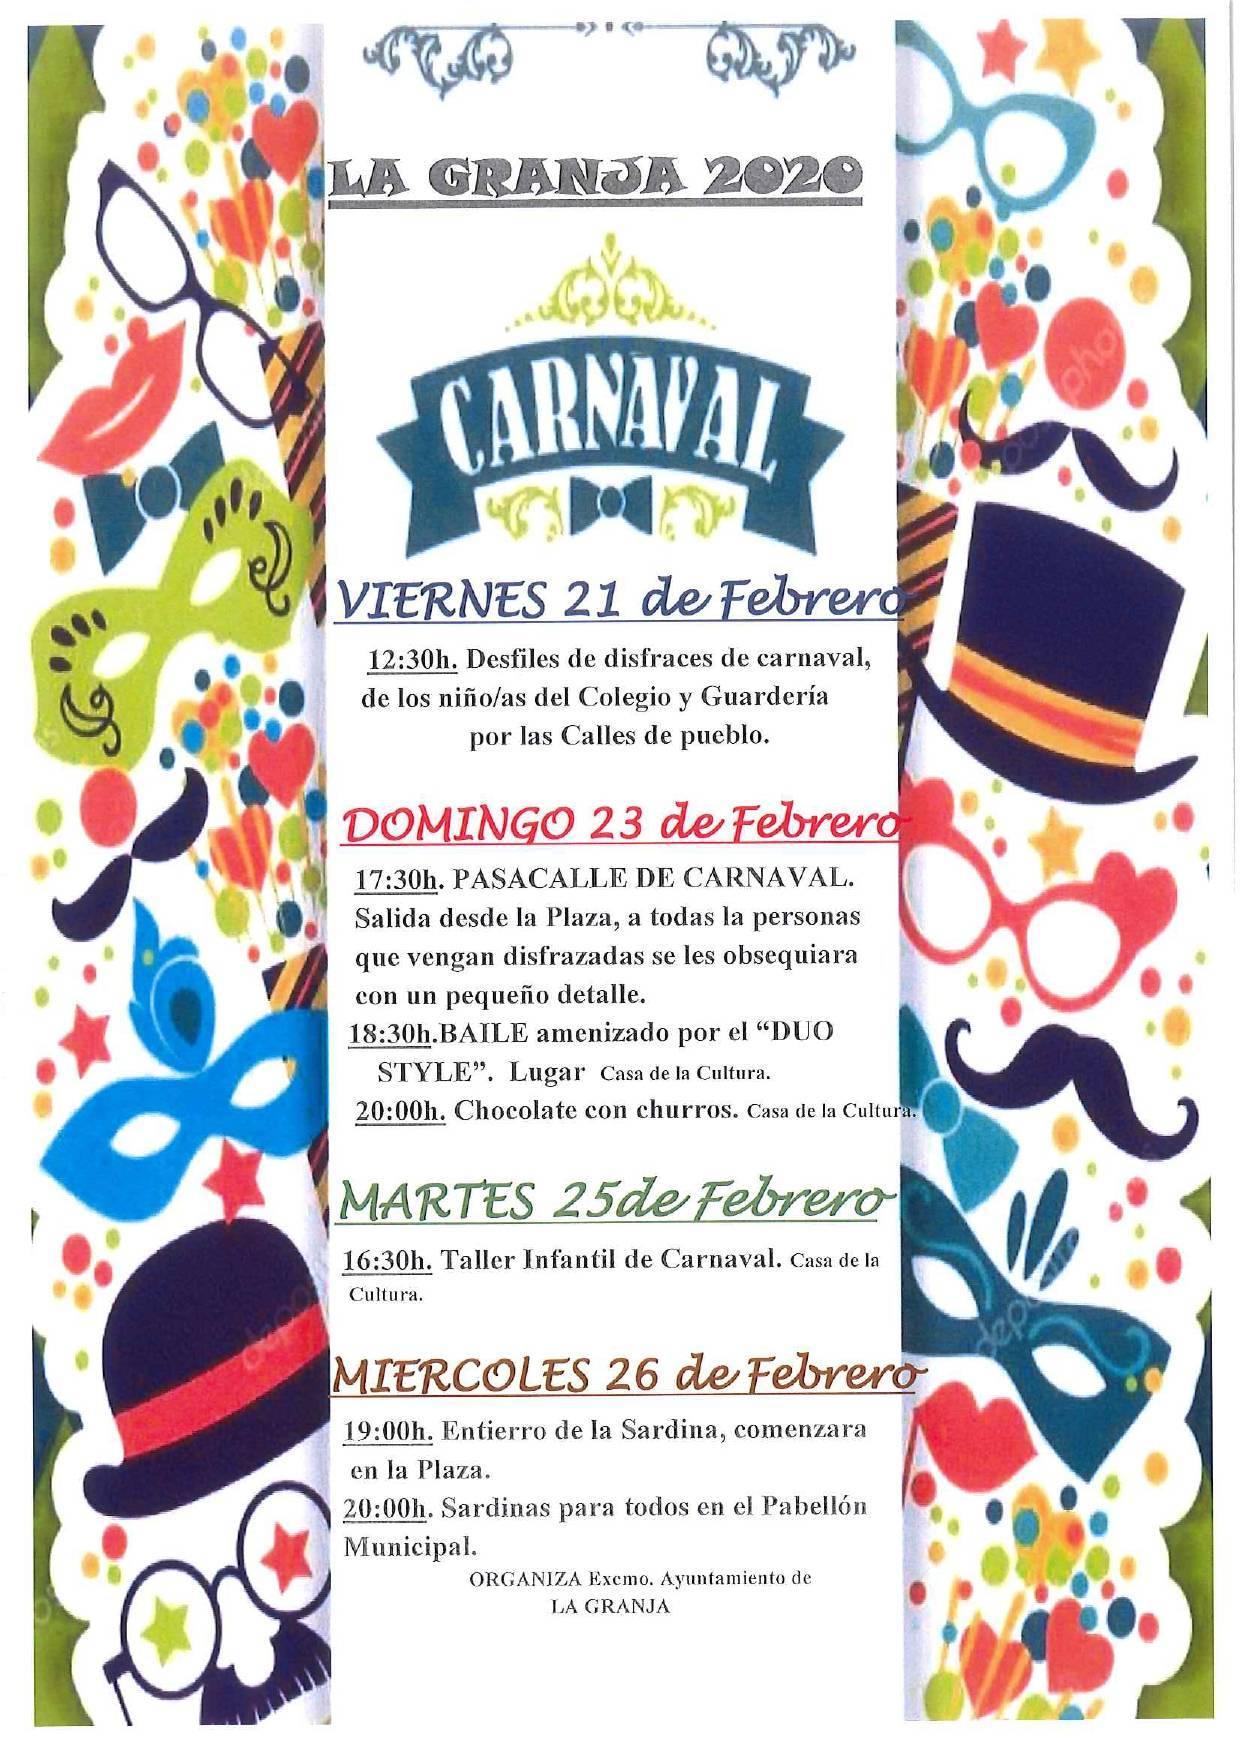 Carnaval 2020 - La Granja (Cáceres)